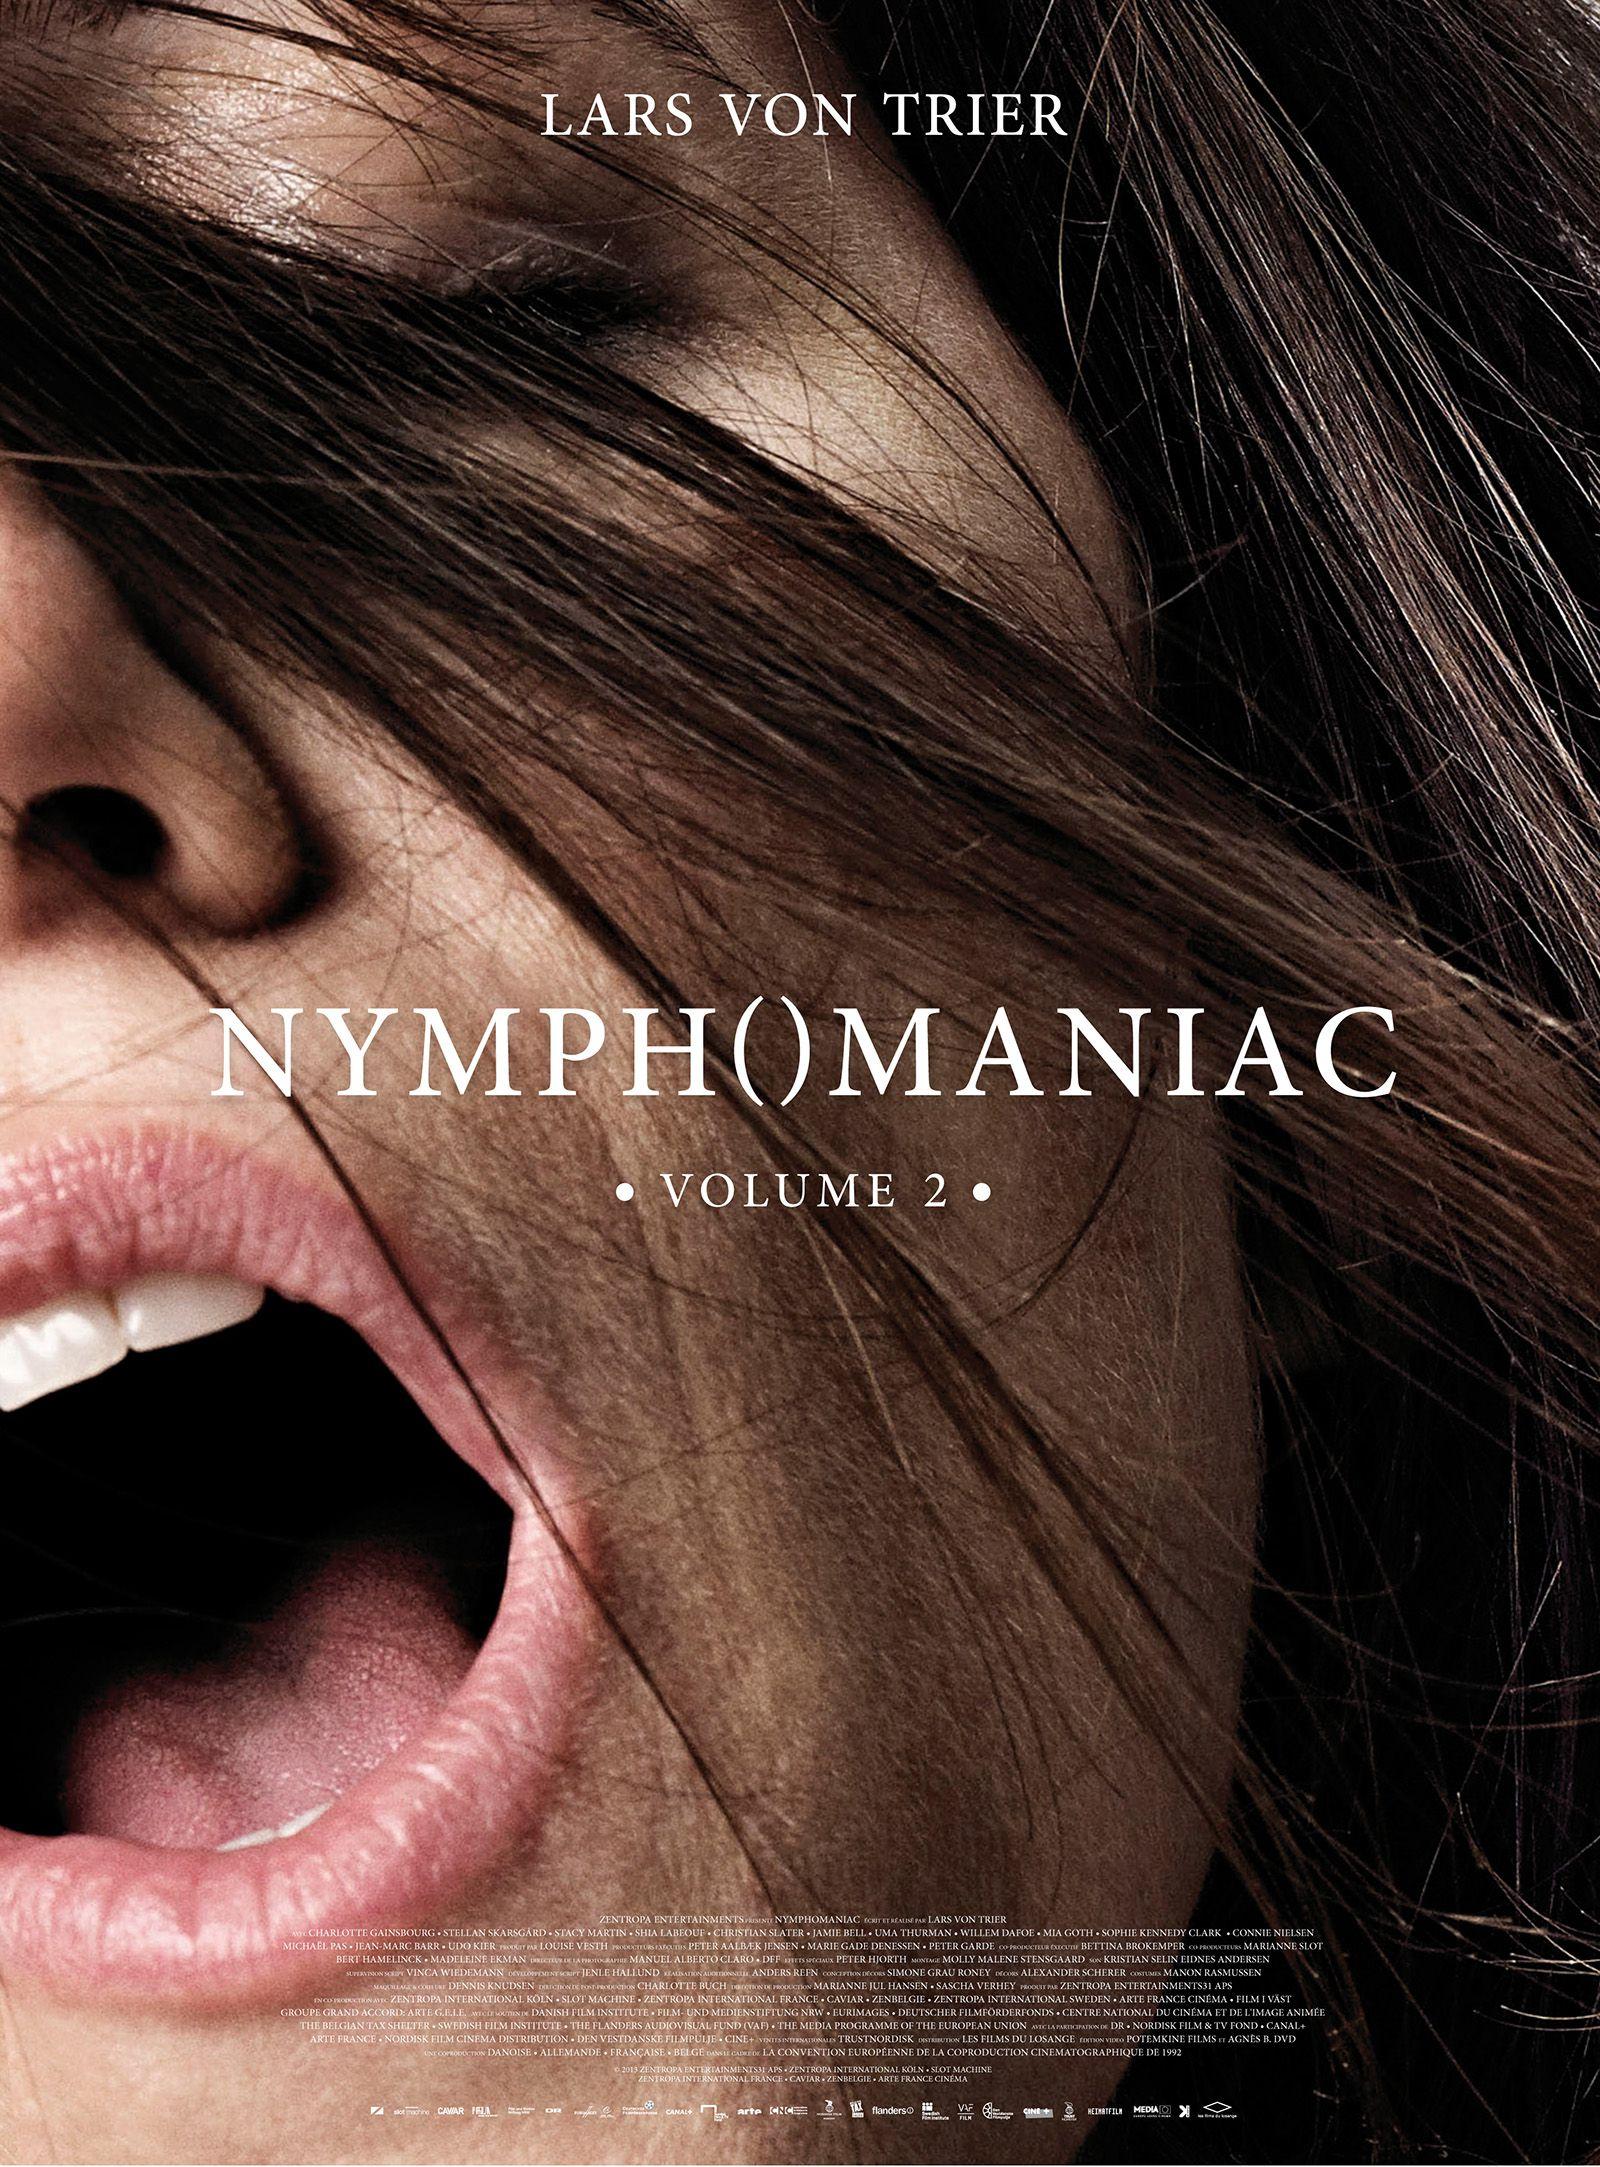 Nymphomaniac : Volume 2 - Film (2013)